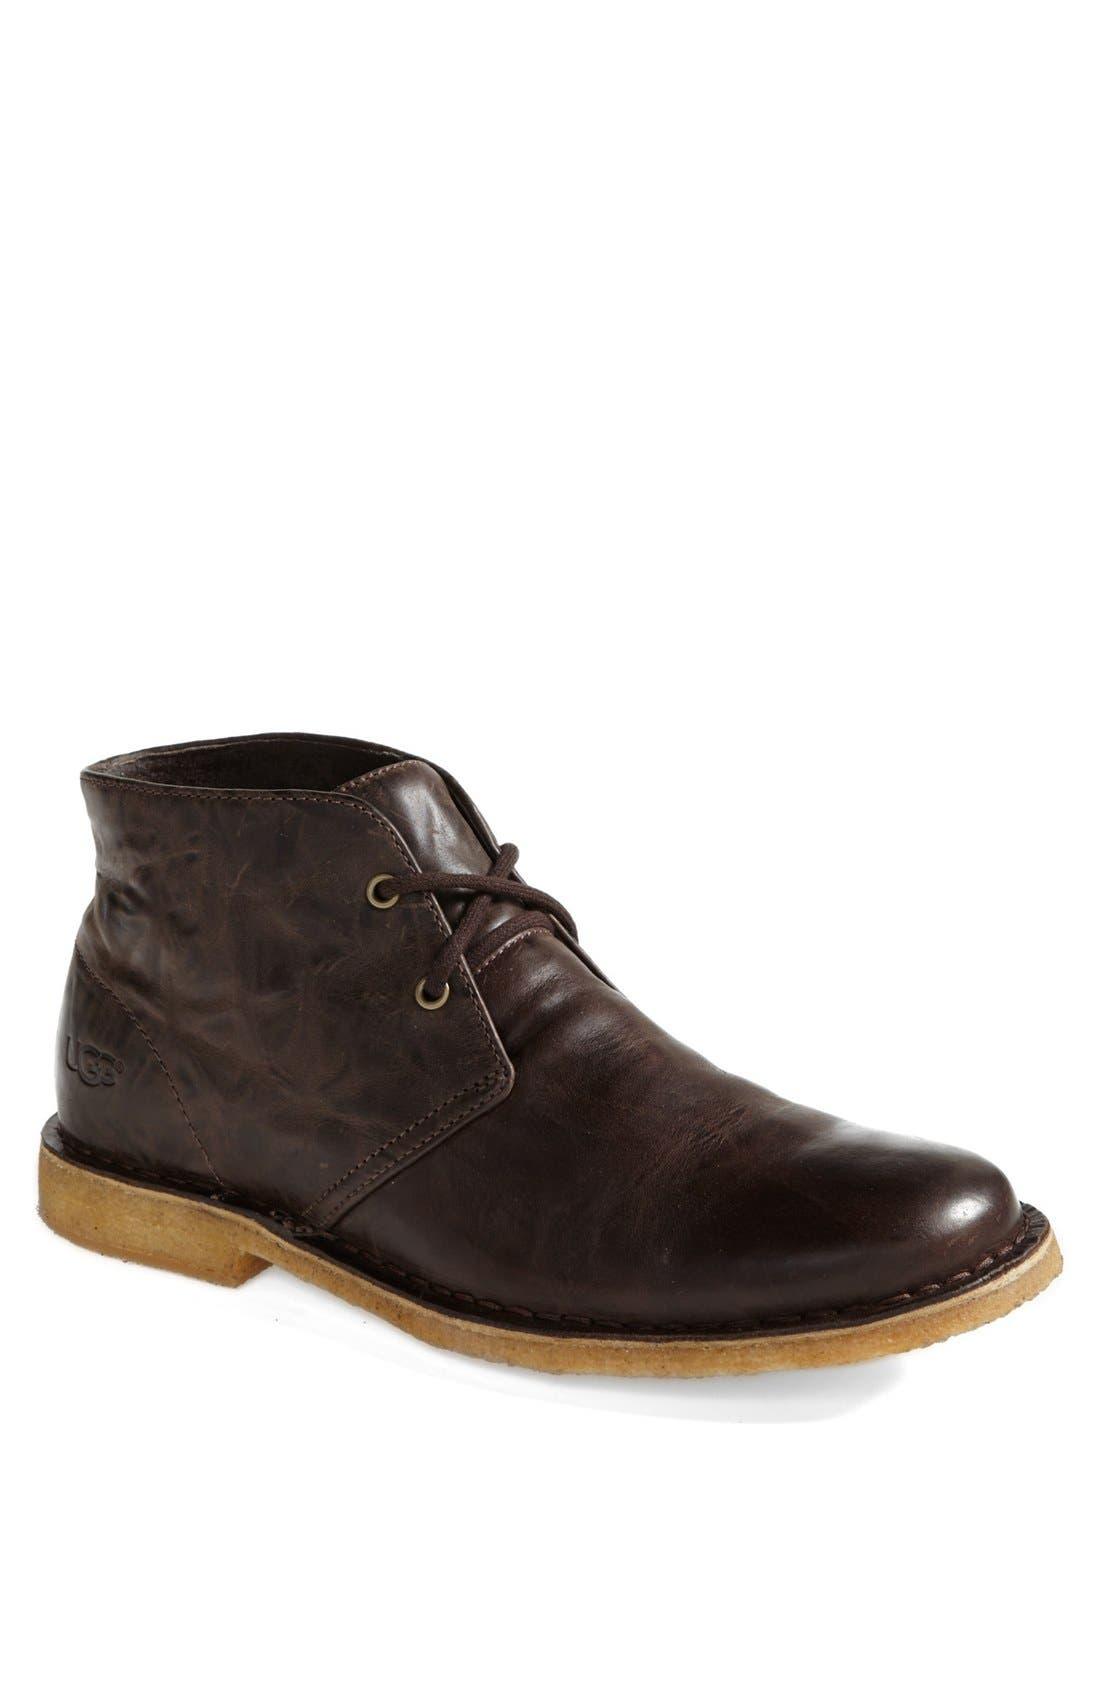 Leighton Chukka Boot, Main, color, 201